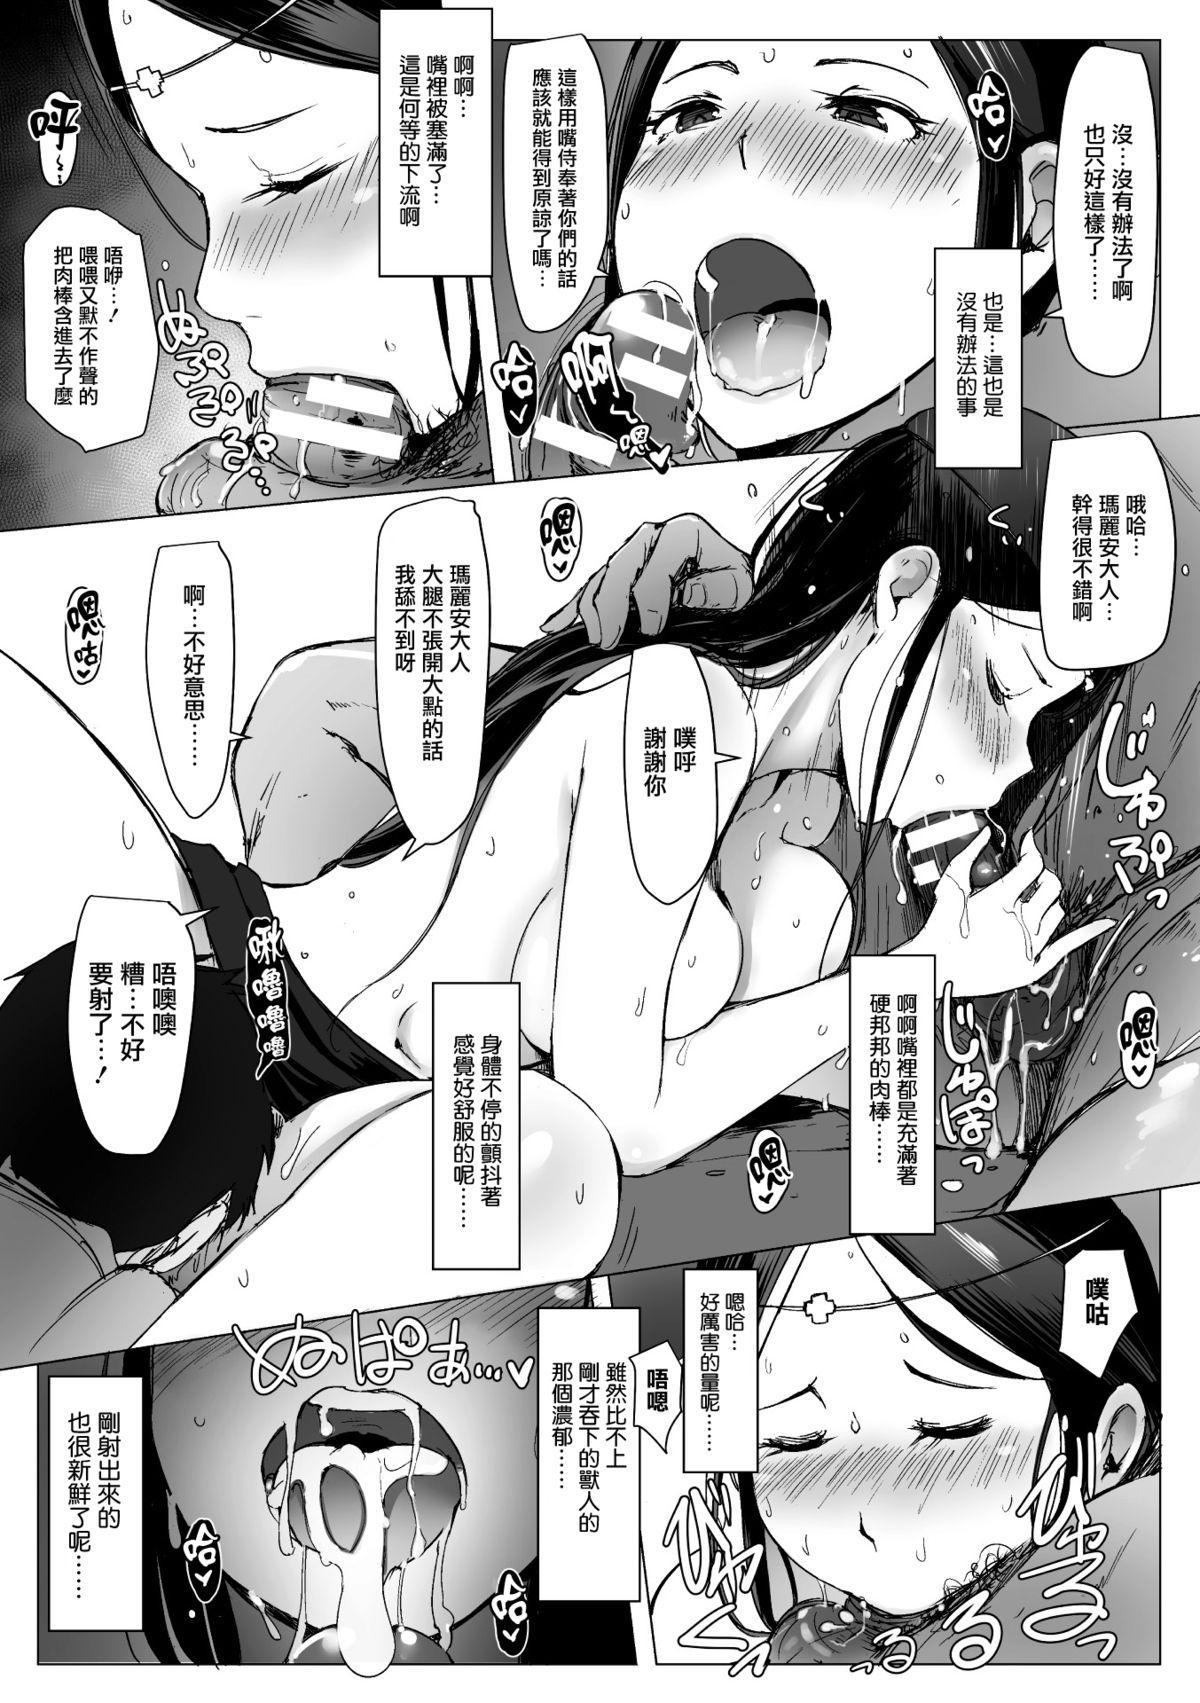 Yamaneko Kishidan Monogatari Onna Kishi Irina Dainiwa 19